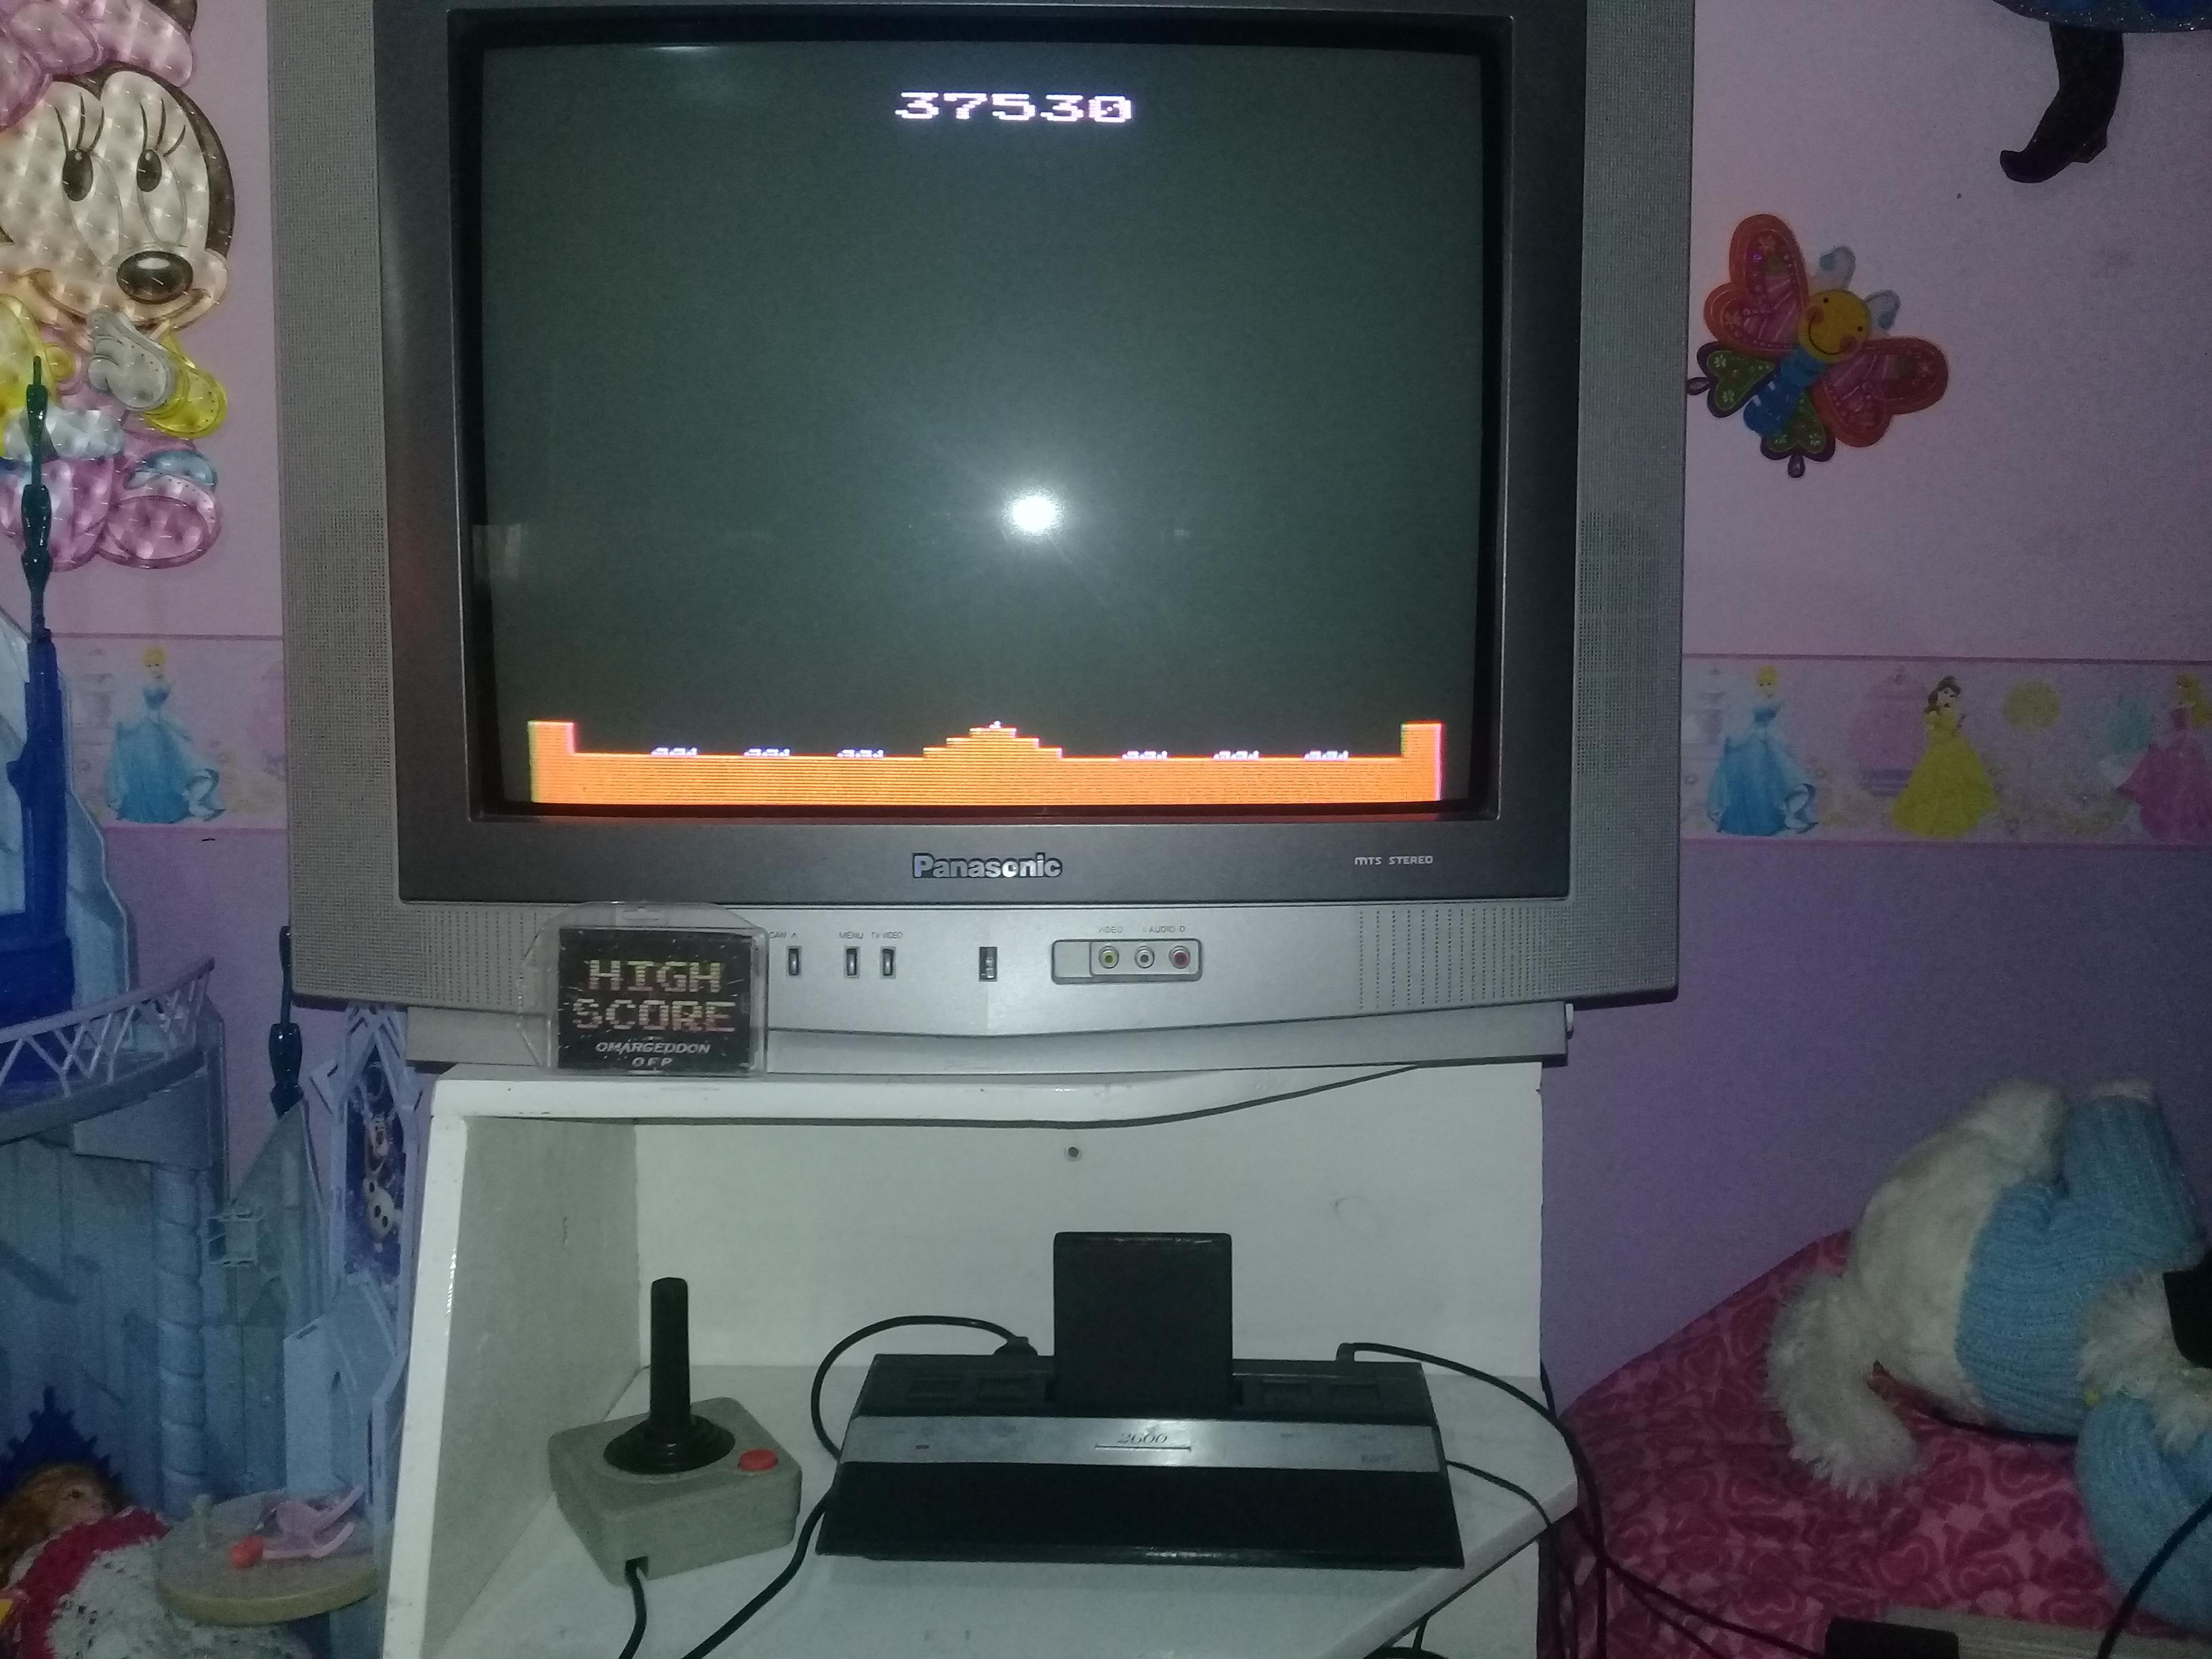 omargeddon: Missile Command: Game 9 (Atari 2600 Novice/B) 37,530 points on 2019-05-06 17:17:21